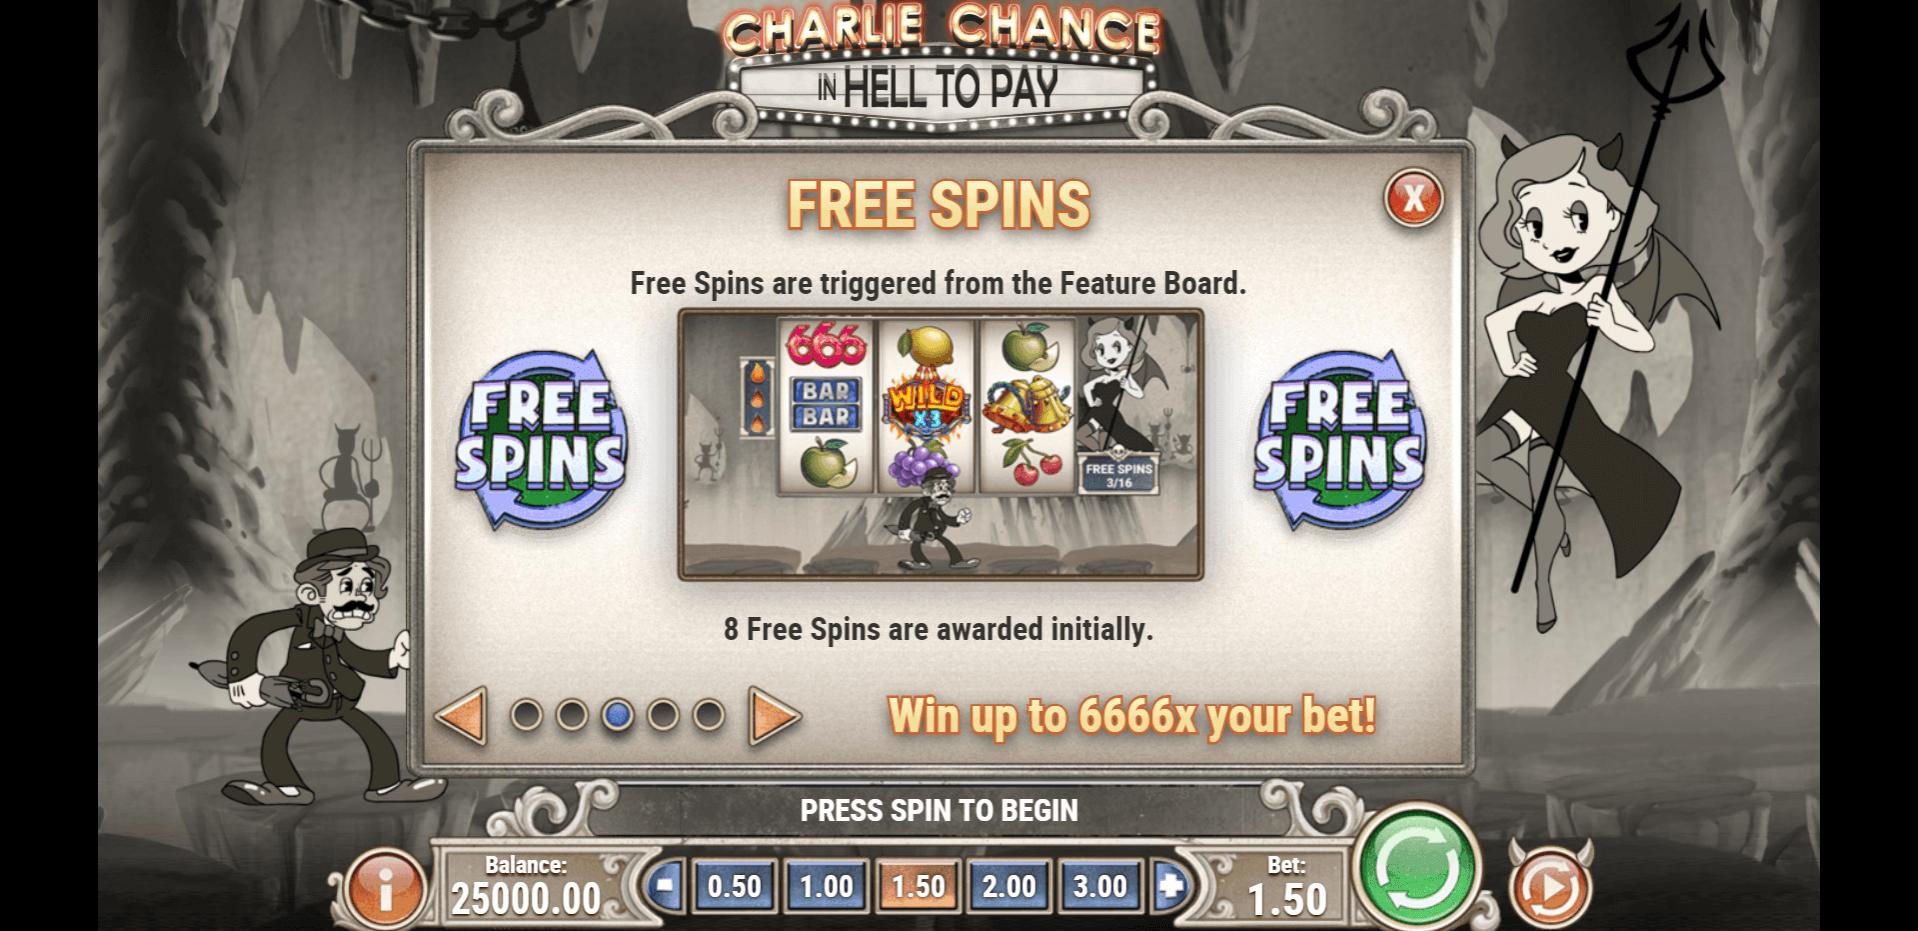 Virgin games free spins no deposit